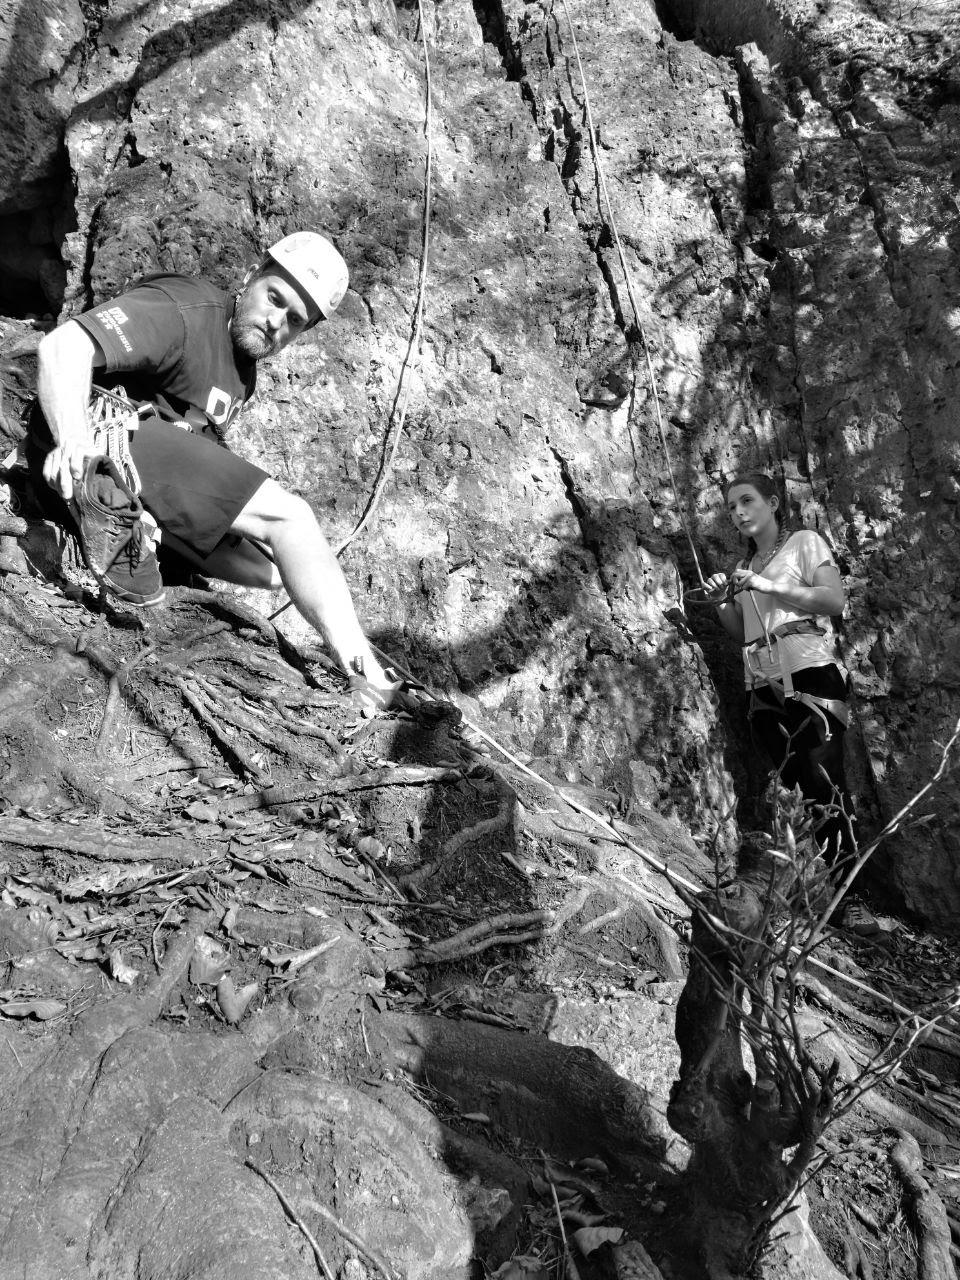 climber preparing